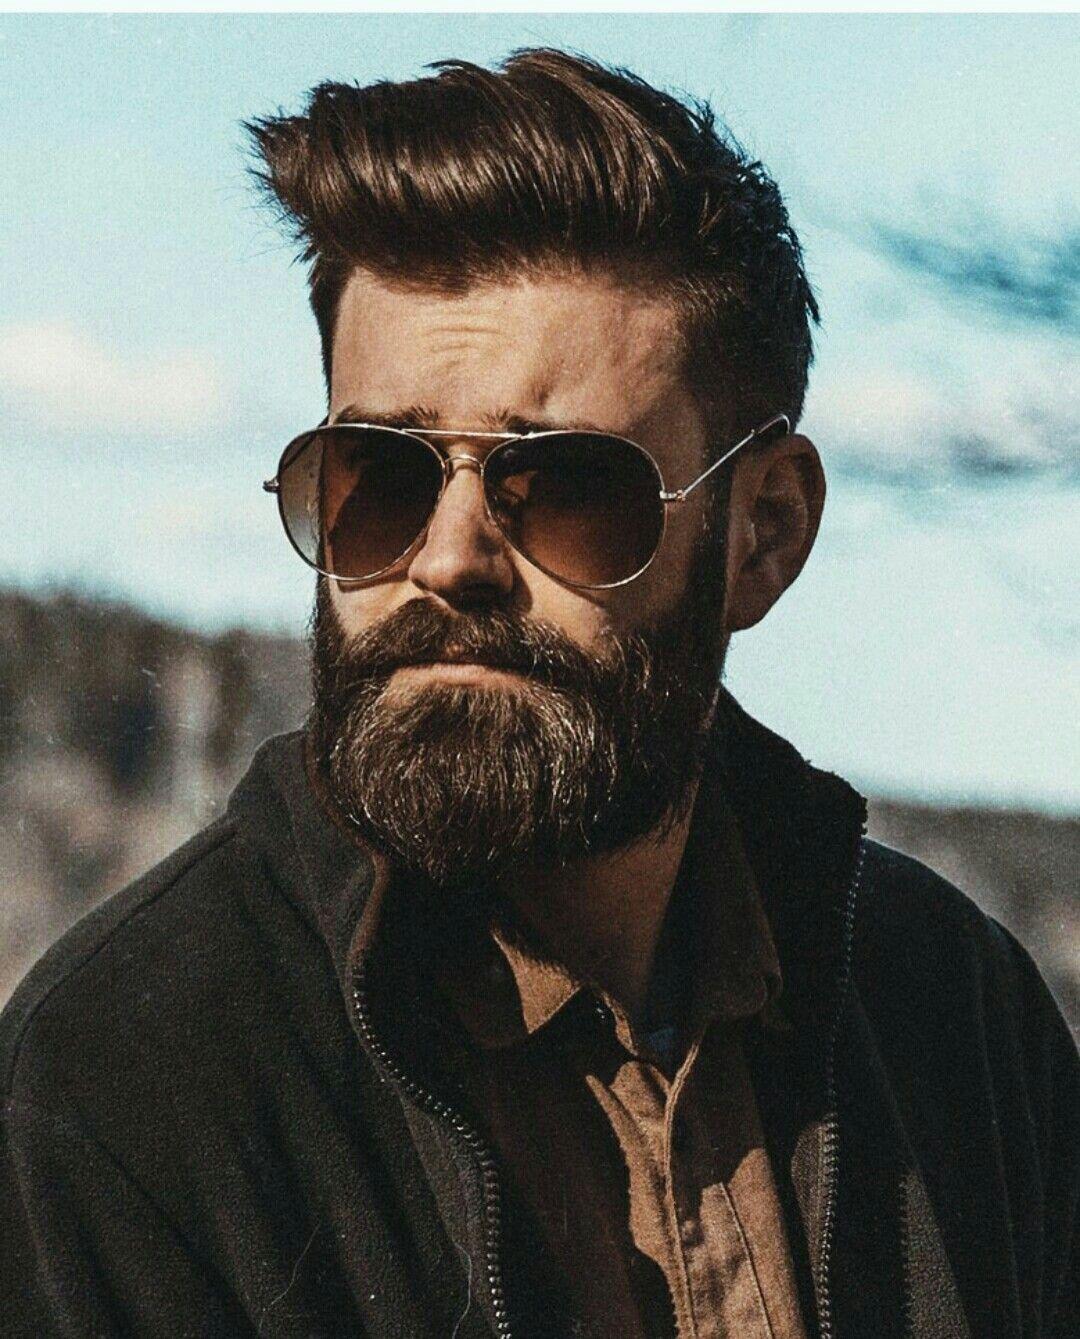 6 proven tips for growing an awesome beard | ezaz shaikh